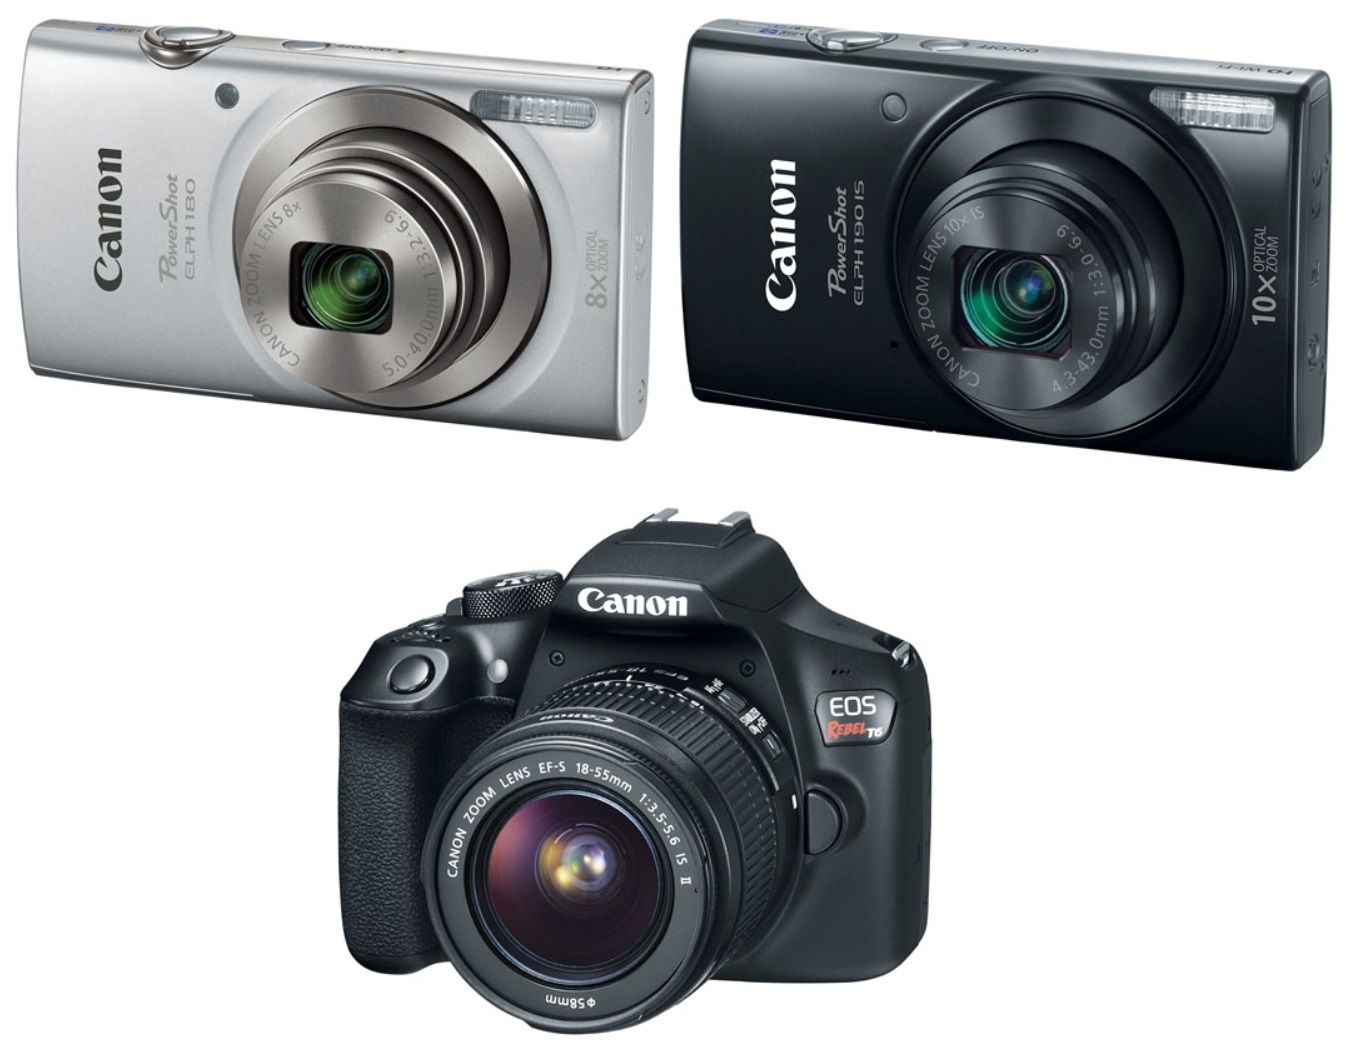 July 4th Canon Refurbished Camera Sale – PowerShot Elph 180